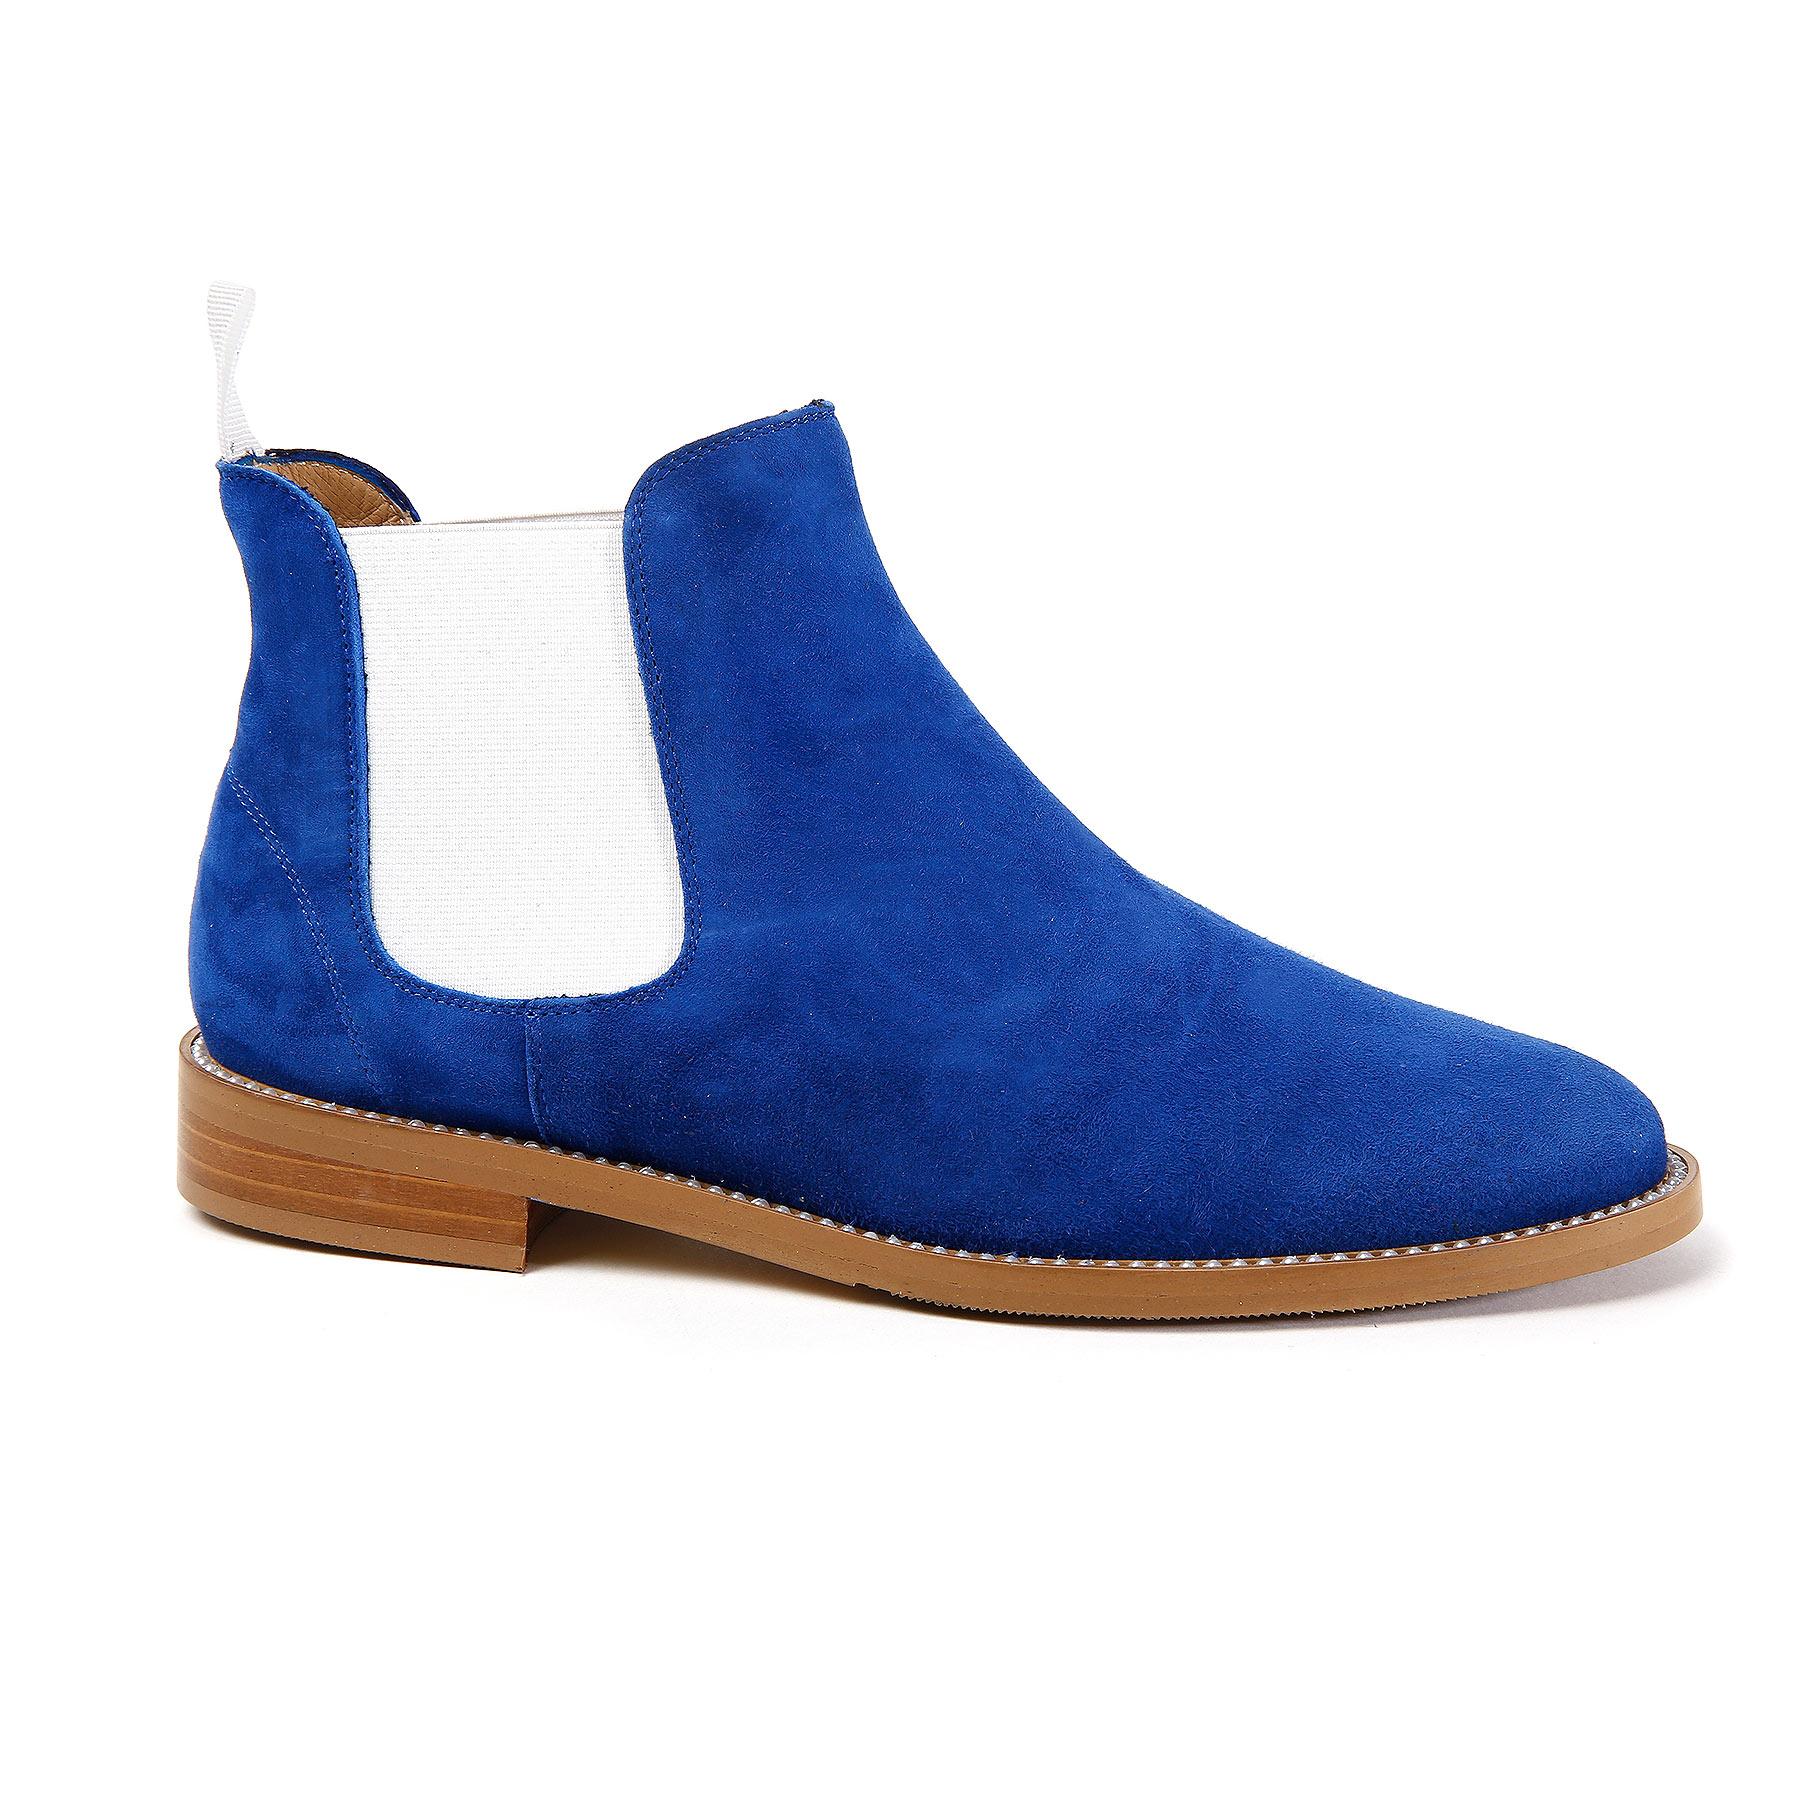 Royal Blue Suede Chelsea Boot – Nicola